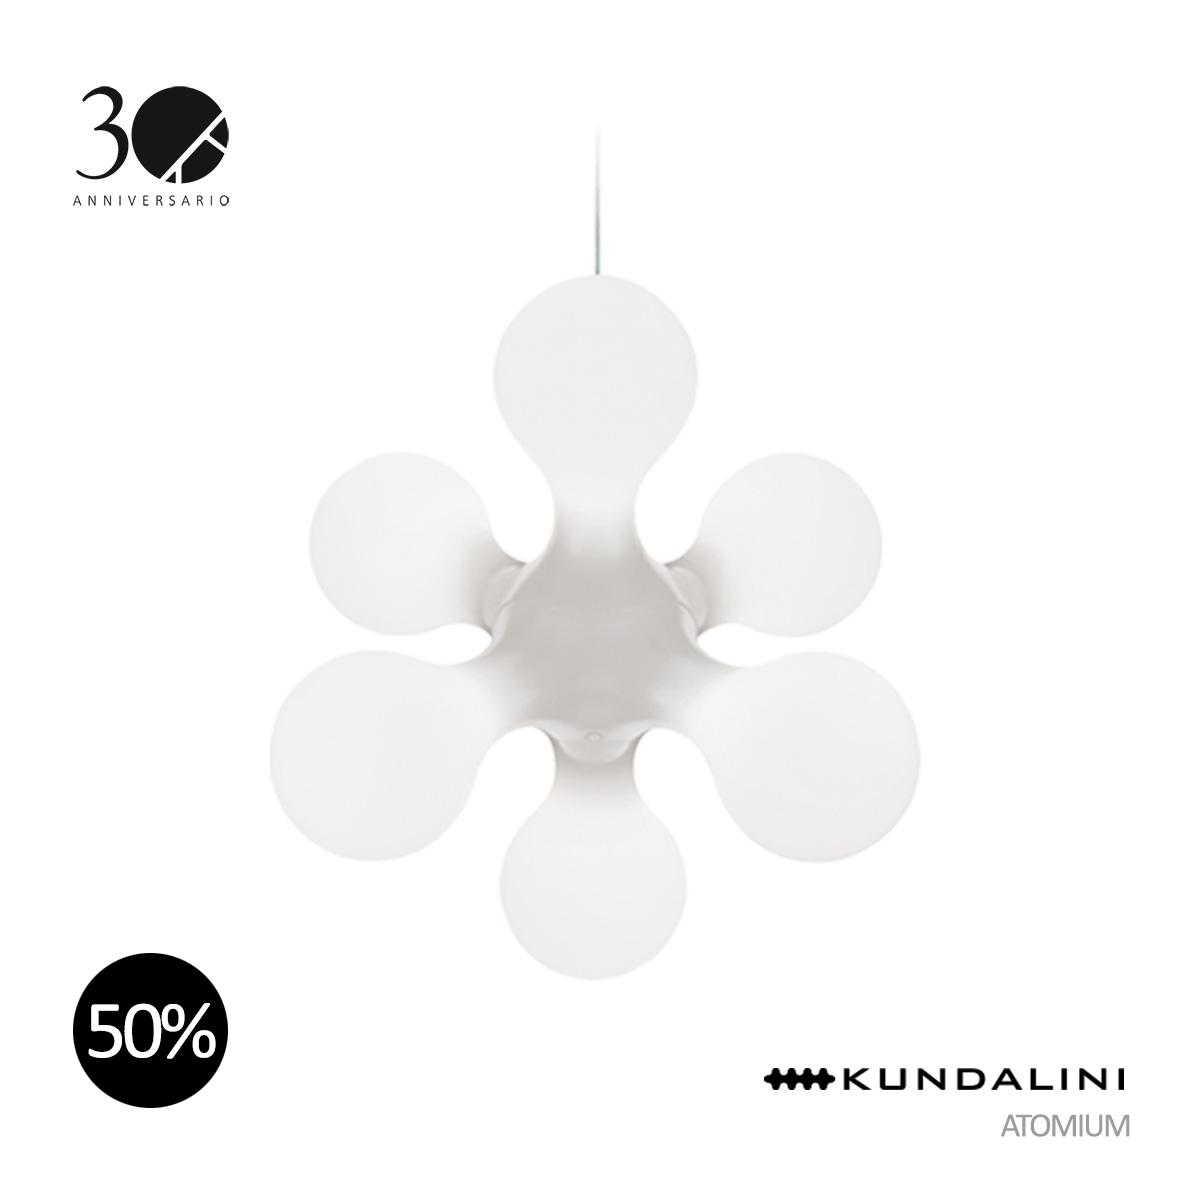 kundalini - atomium